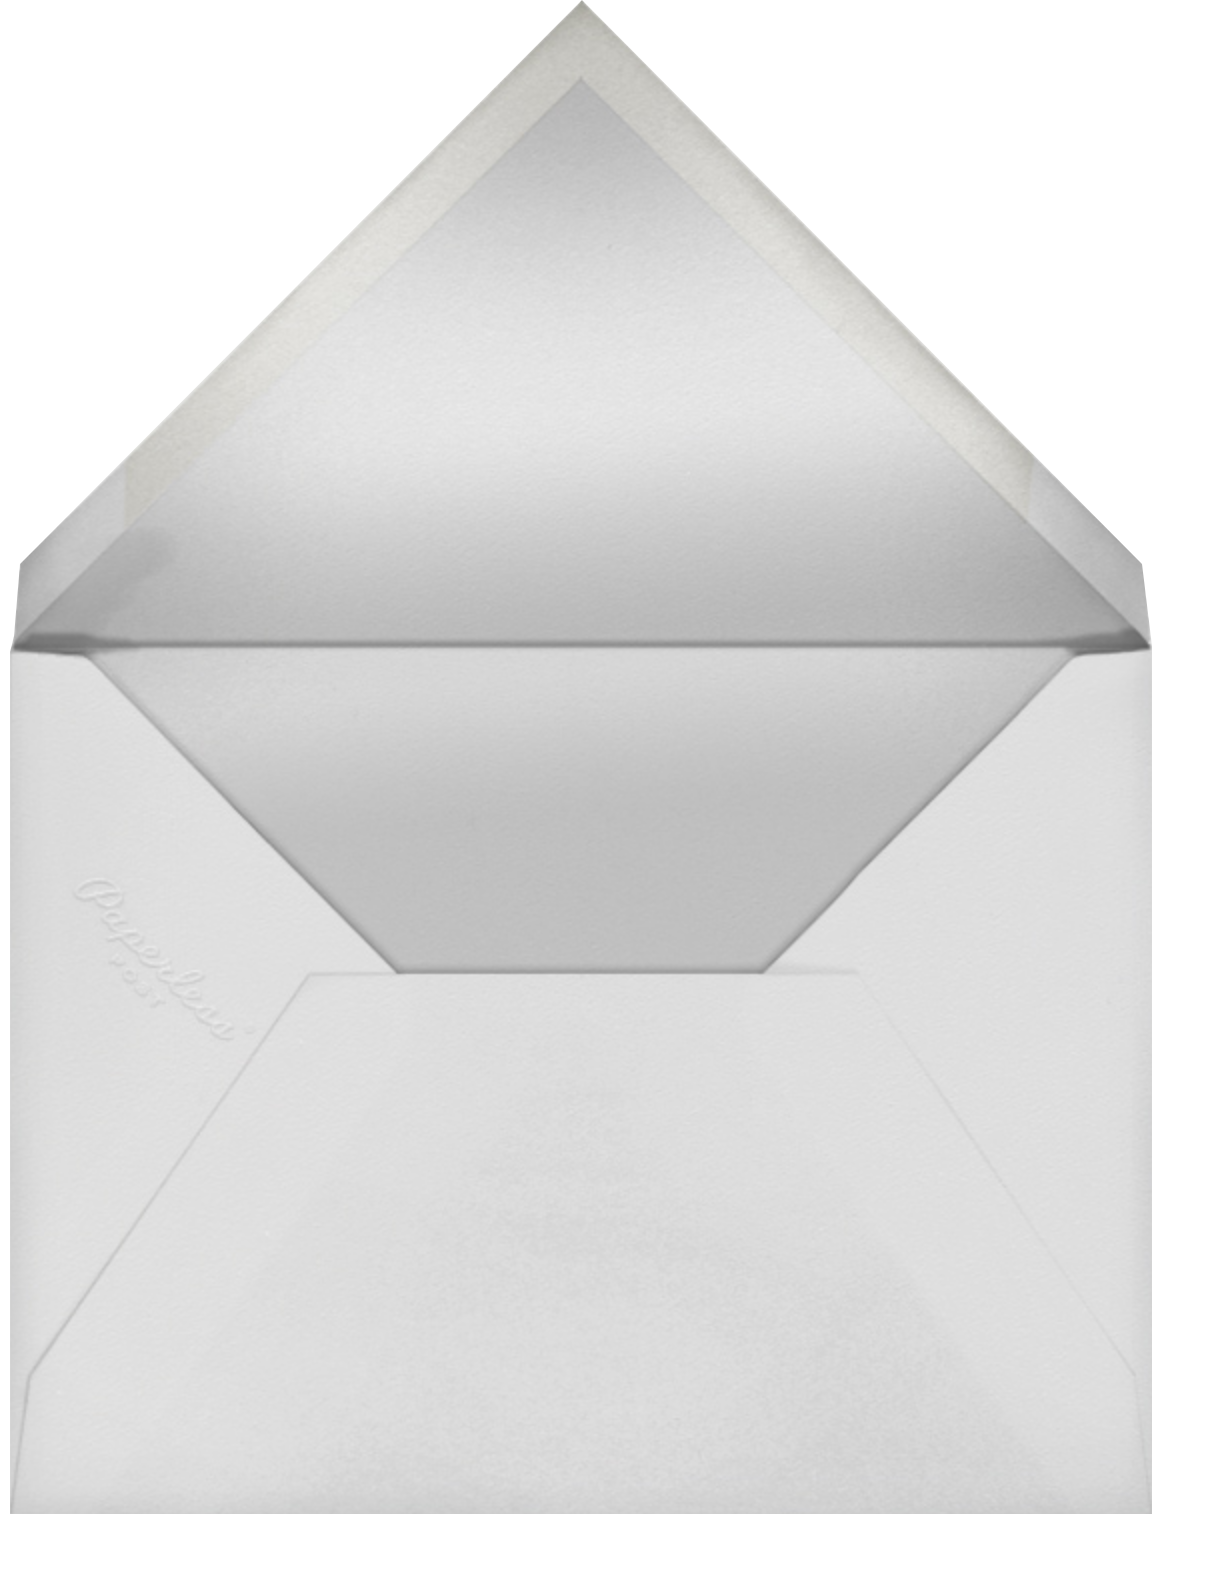 Mr. Chili Wills (Program) - Mr. Boddington's Studio - Menus and programs - envelope back